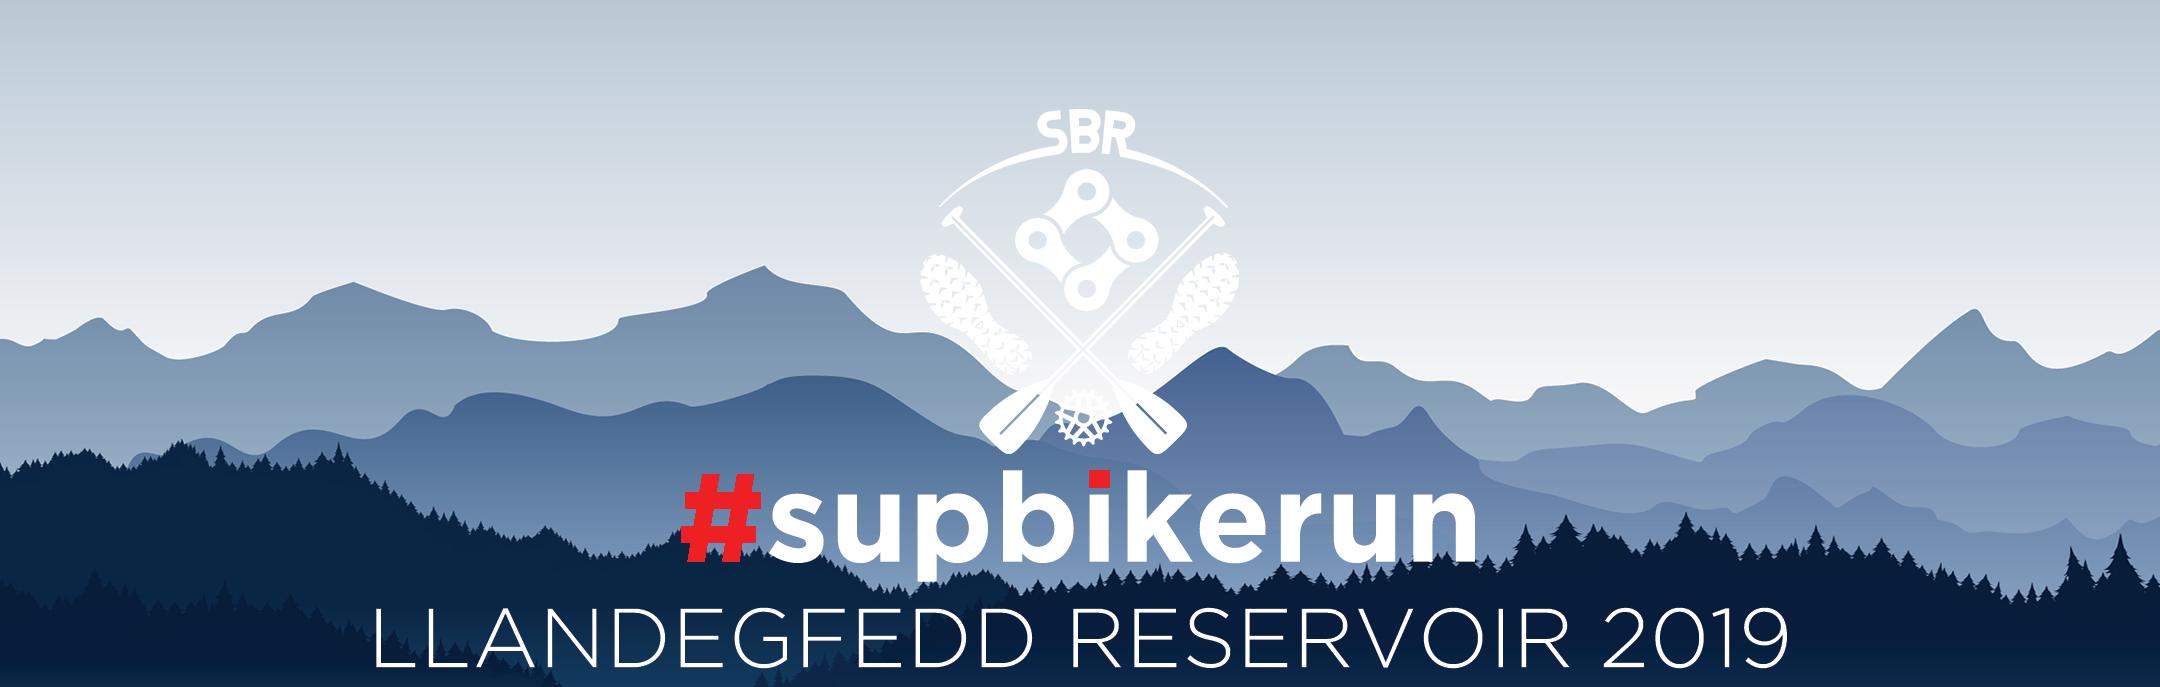 #supbikerun-Llandegfedd-Reservoir-2019